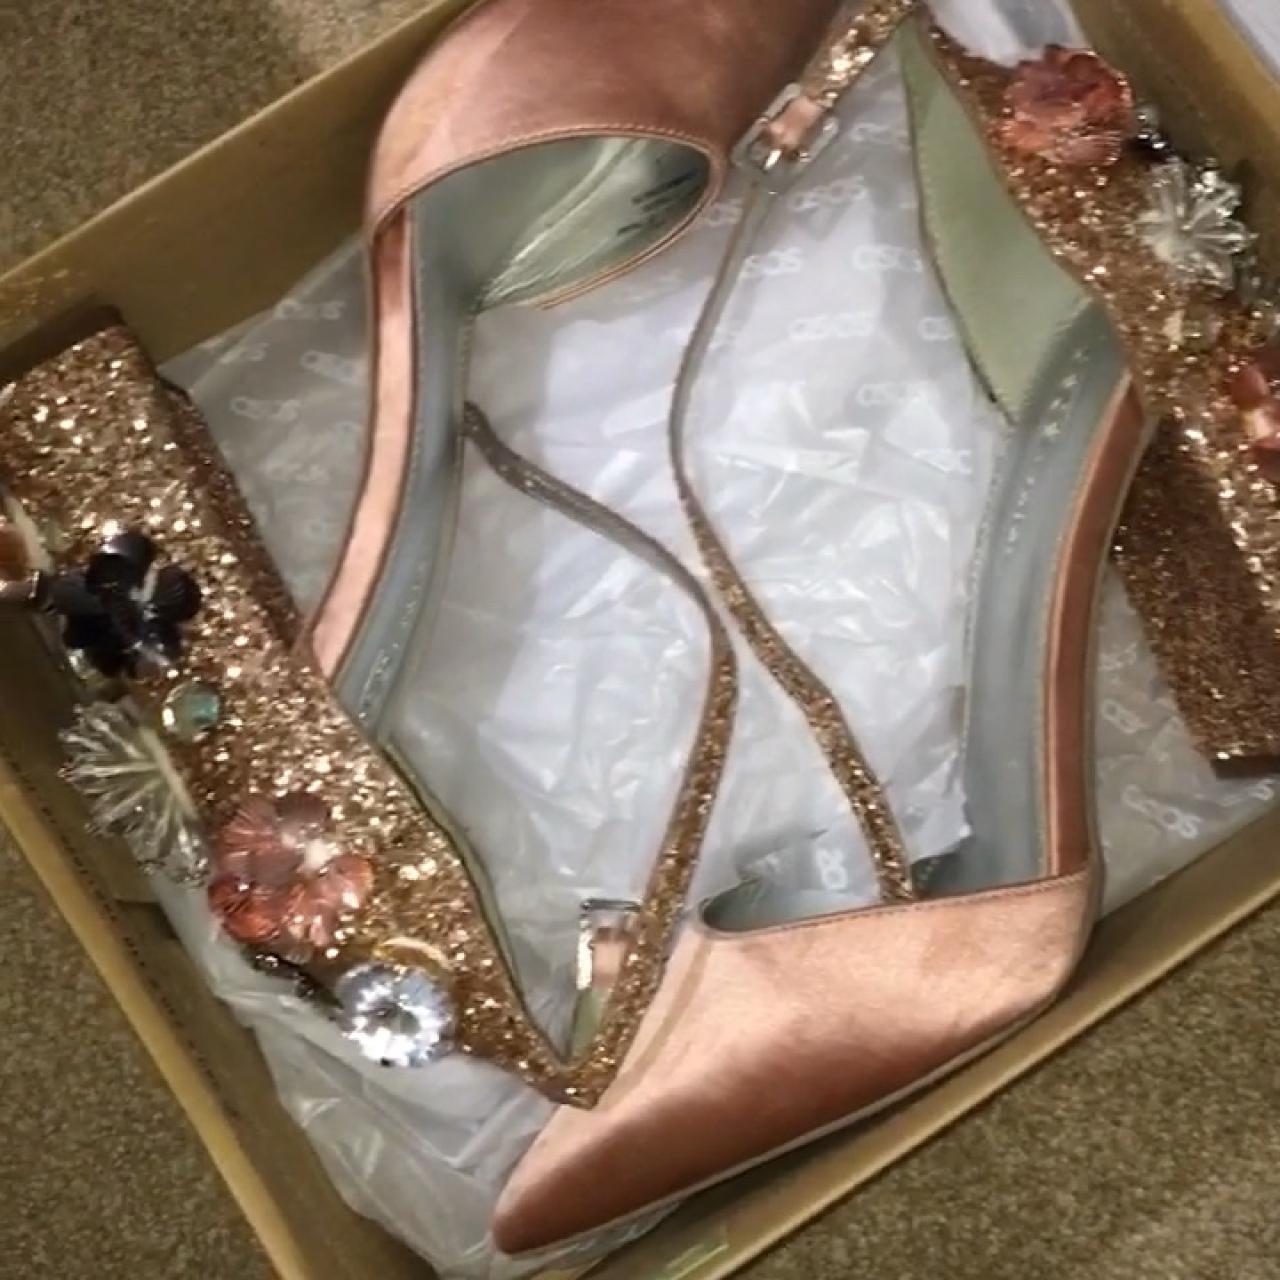 64cf44dac86e ASOS design passionate embellished high heels Comfortable in - Depop